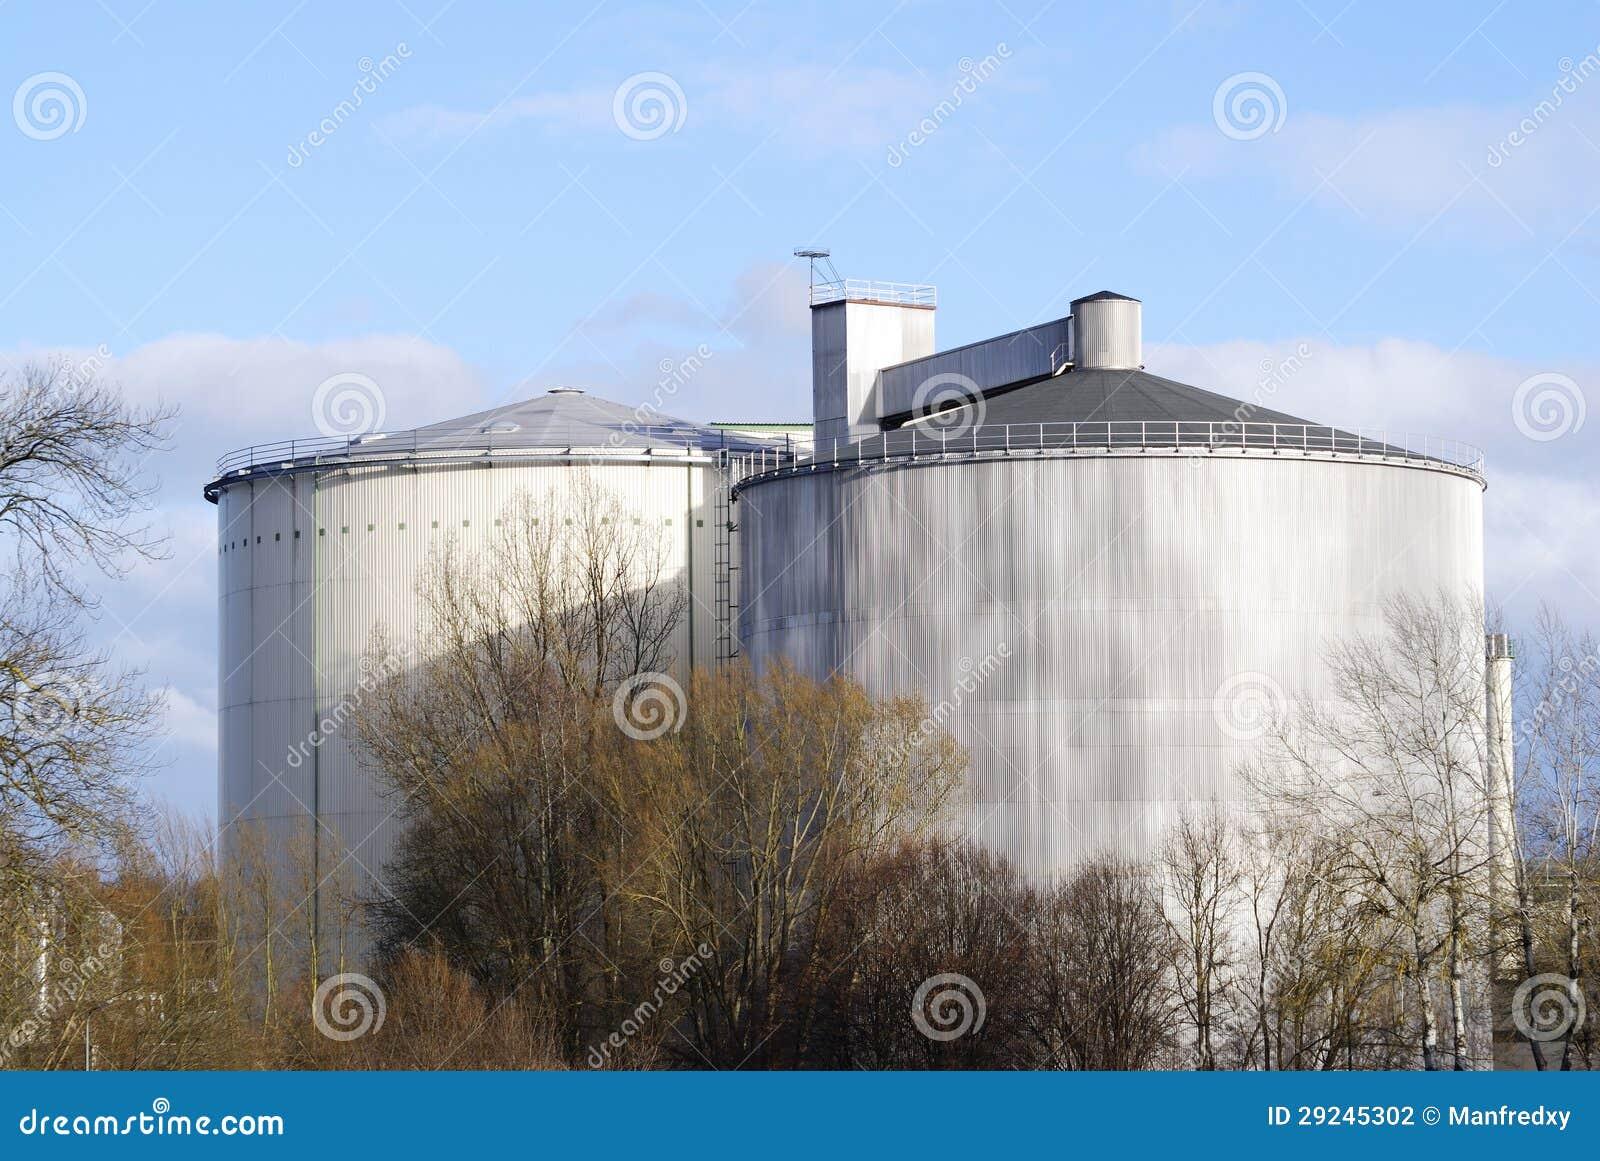 Download Tanque de armazenamento foto de stock. Imagem de energia - 29245302